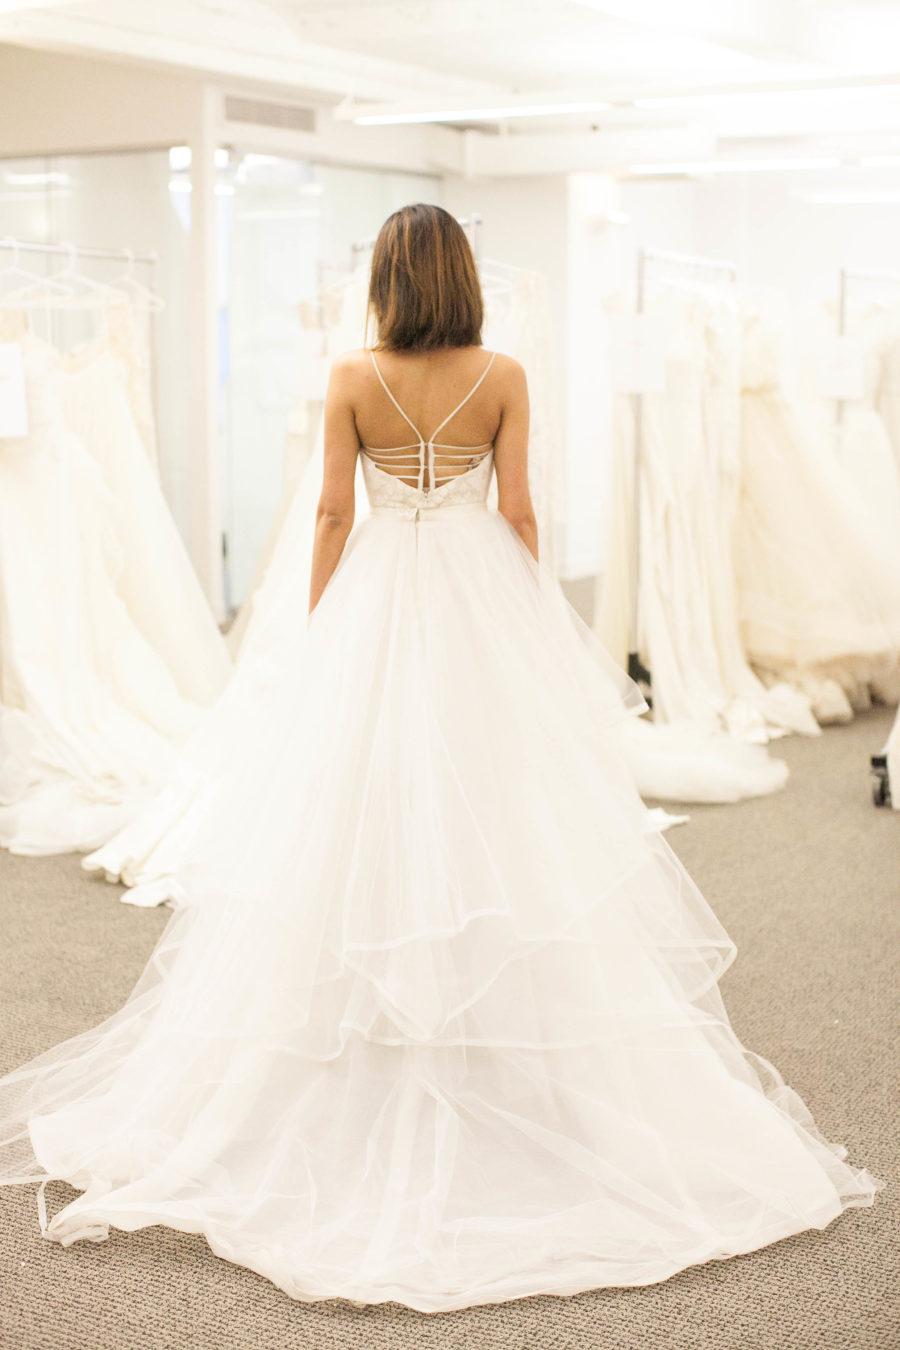 Fat People Wedding Dresses 32 Beautiful